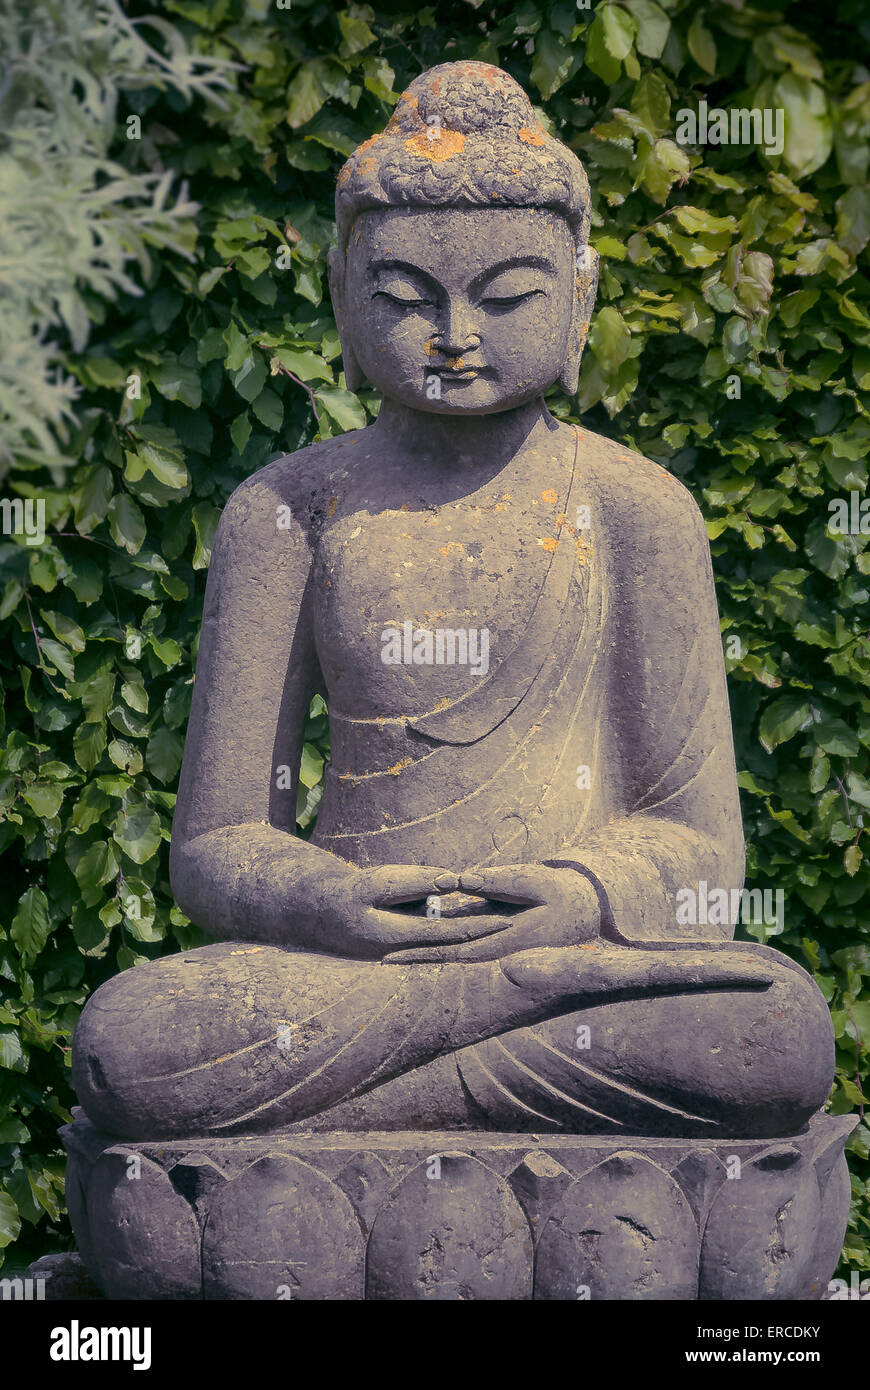 Buddha Statue Im Garten Stockfoto Bild 83252735 Alamy